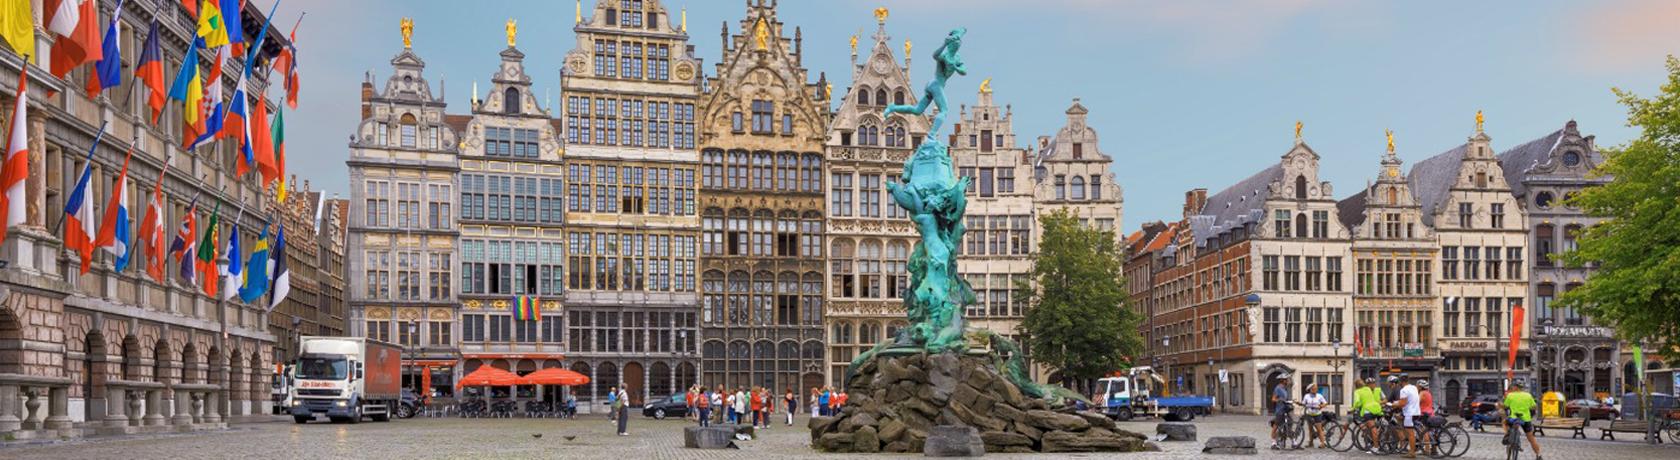 Antwerp.png#asset:236